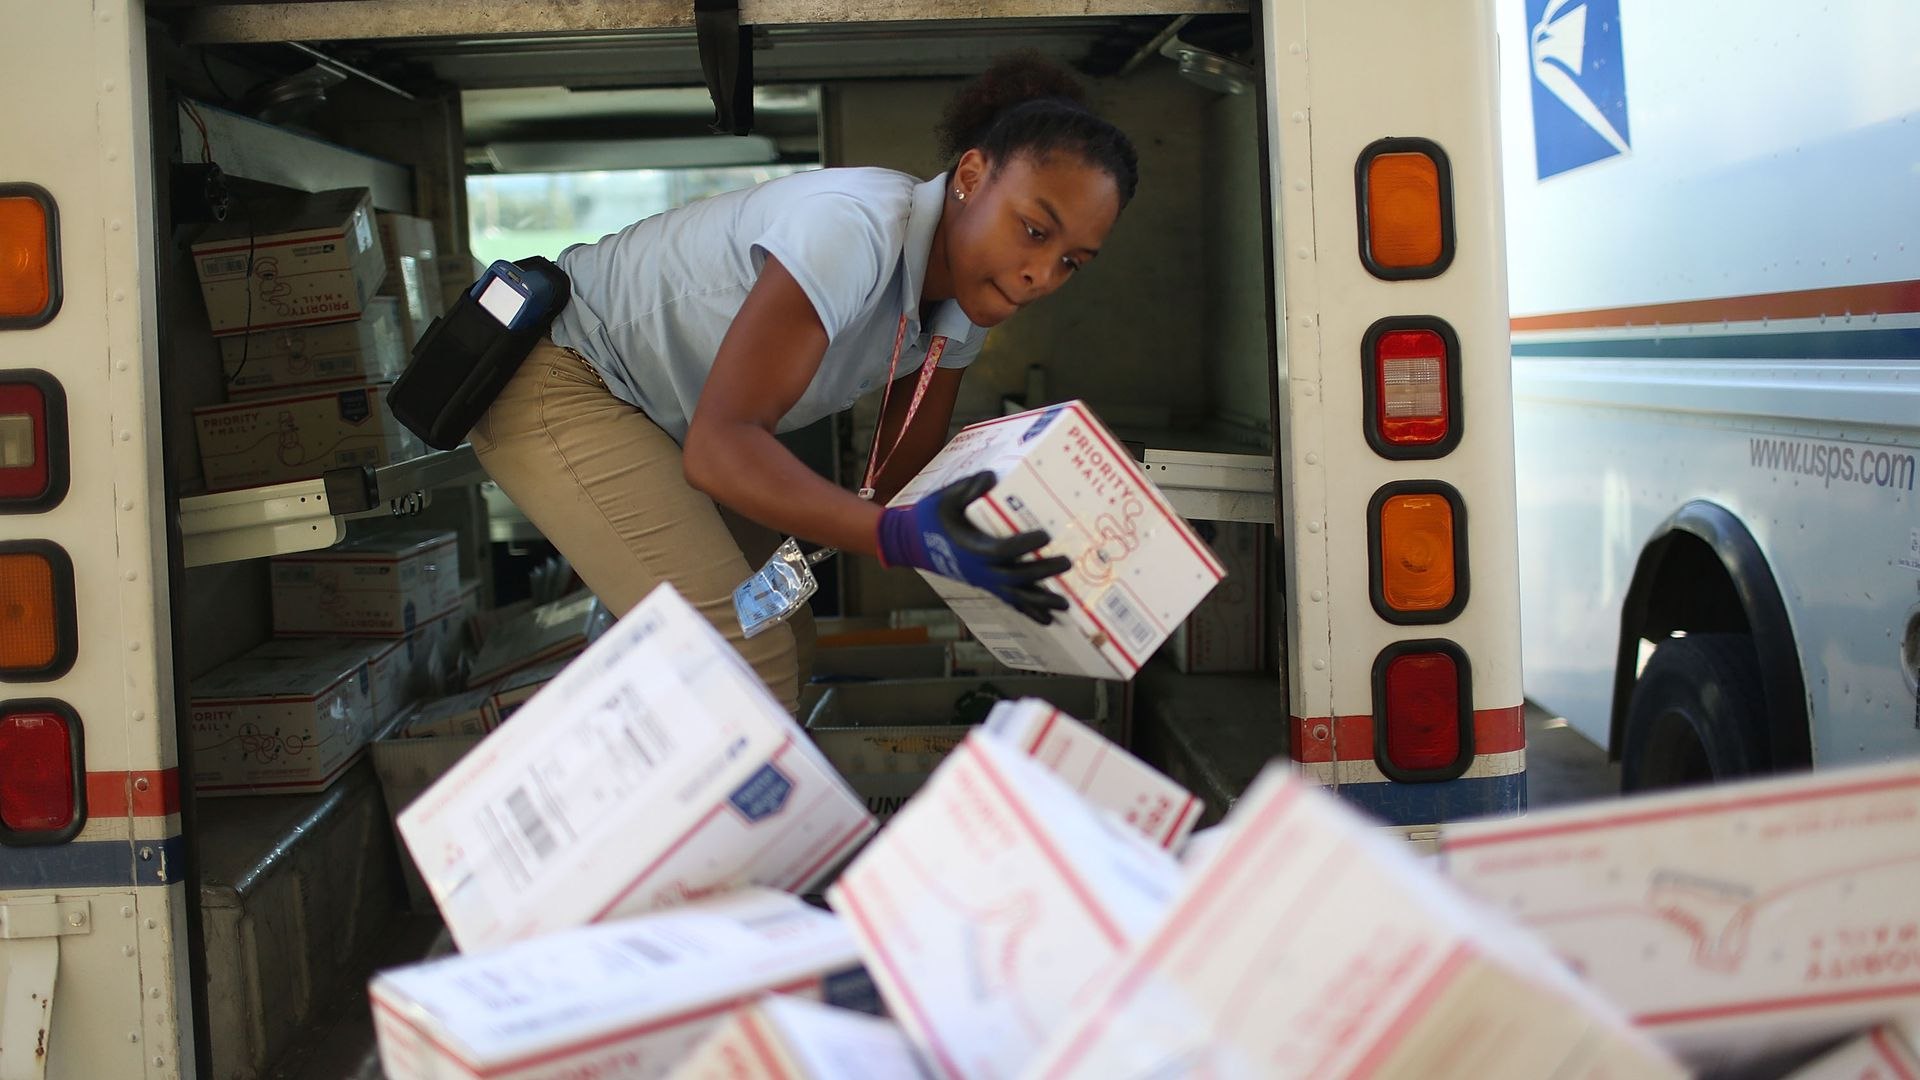 Postal employee unloading boxes